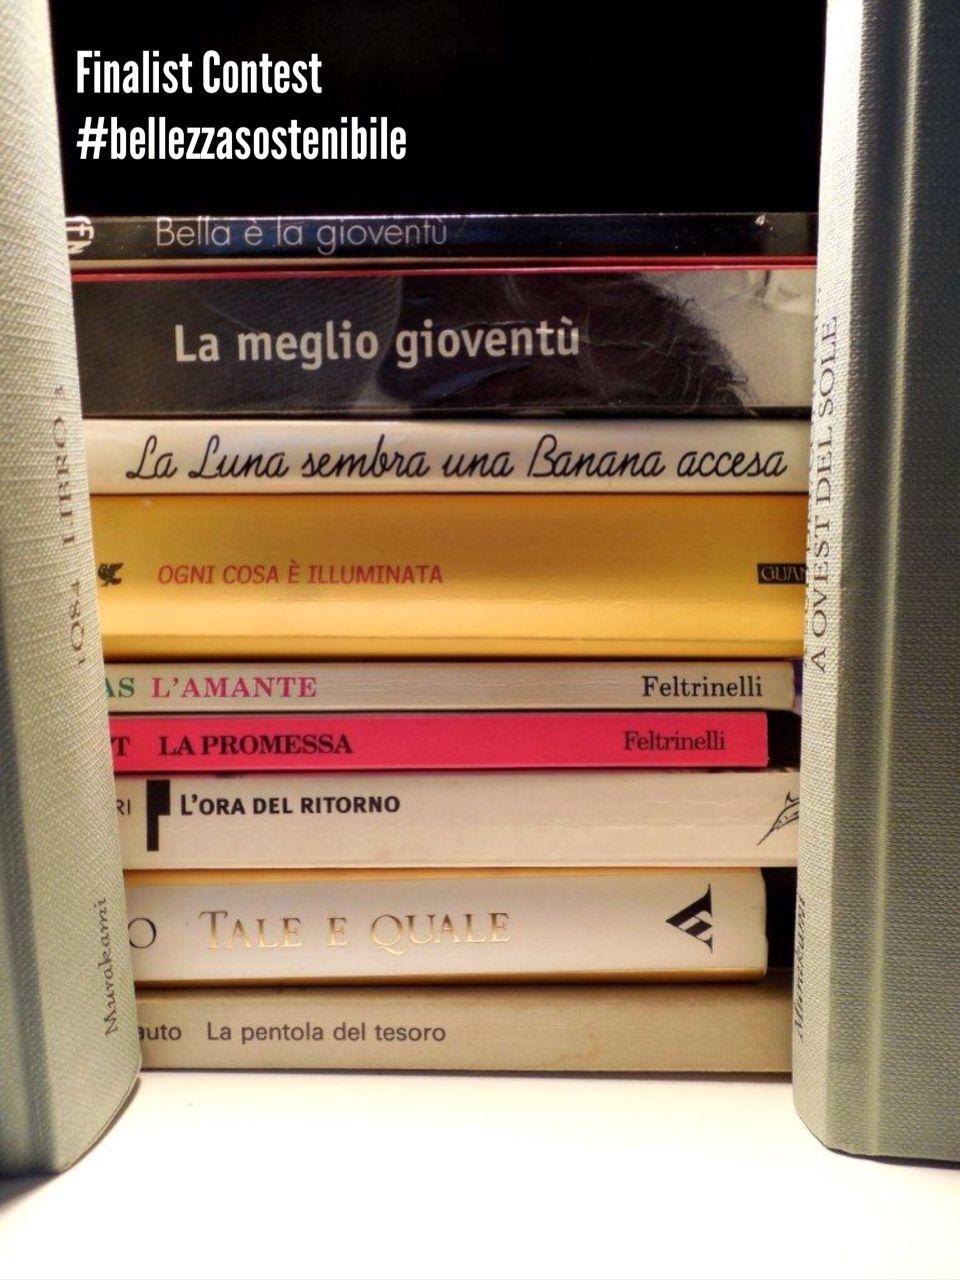 Contest #BellezzaSostenibile 2014! 5° finalist! The author is Paolo Bianti!